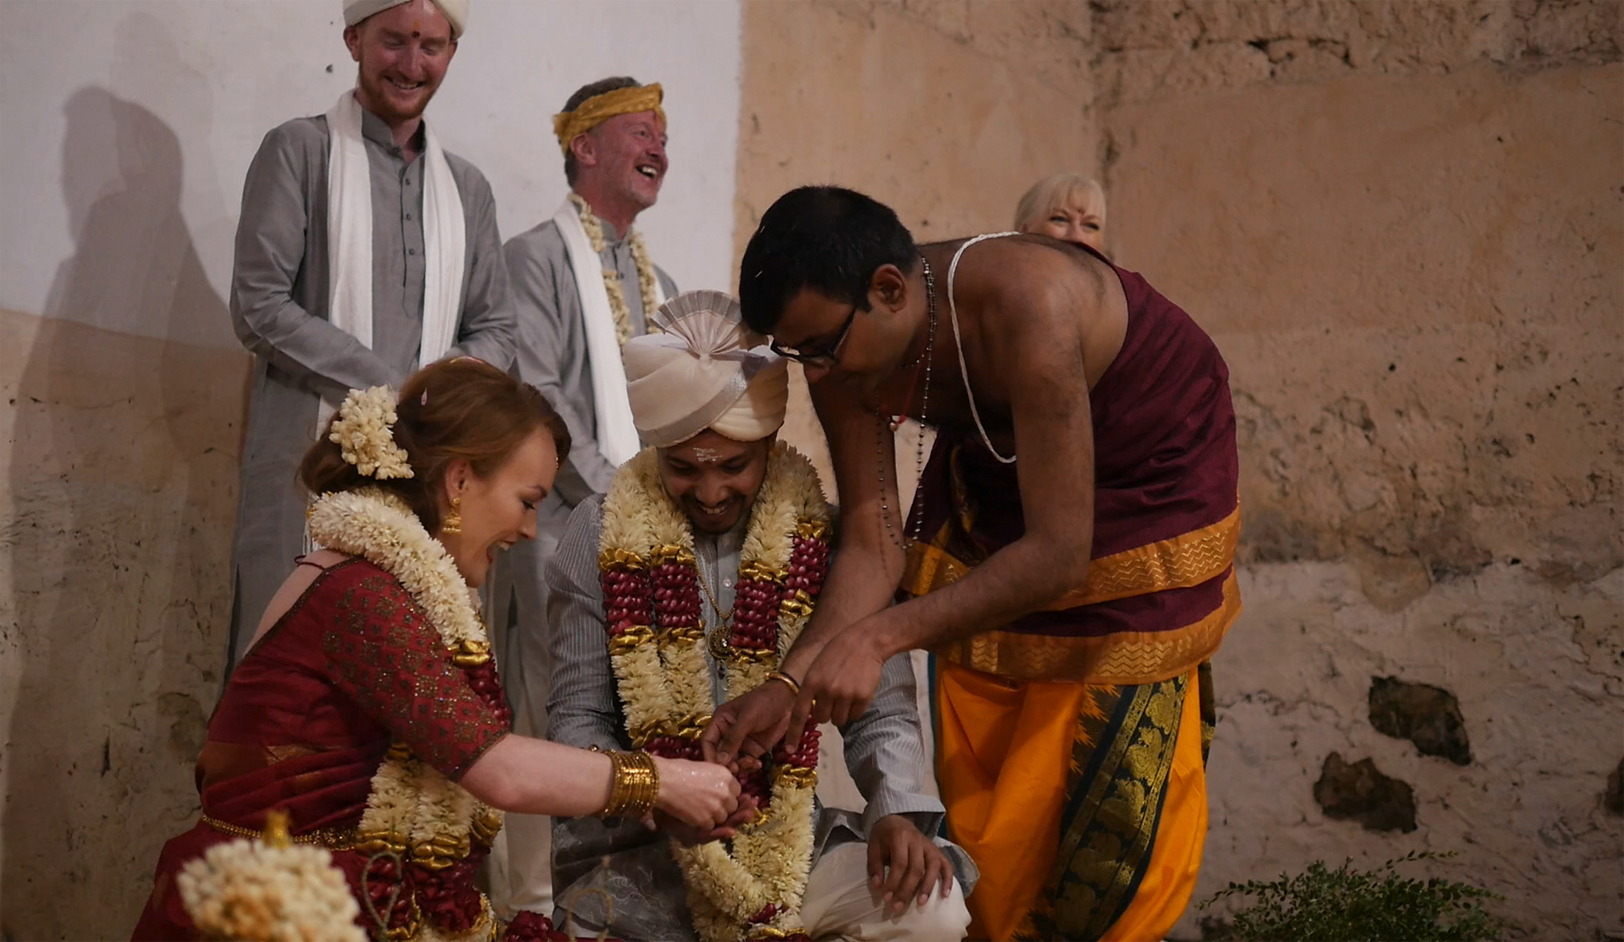 bride-groom-ceremony-indian-wedding.jpg